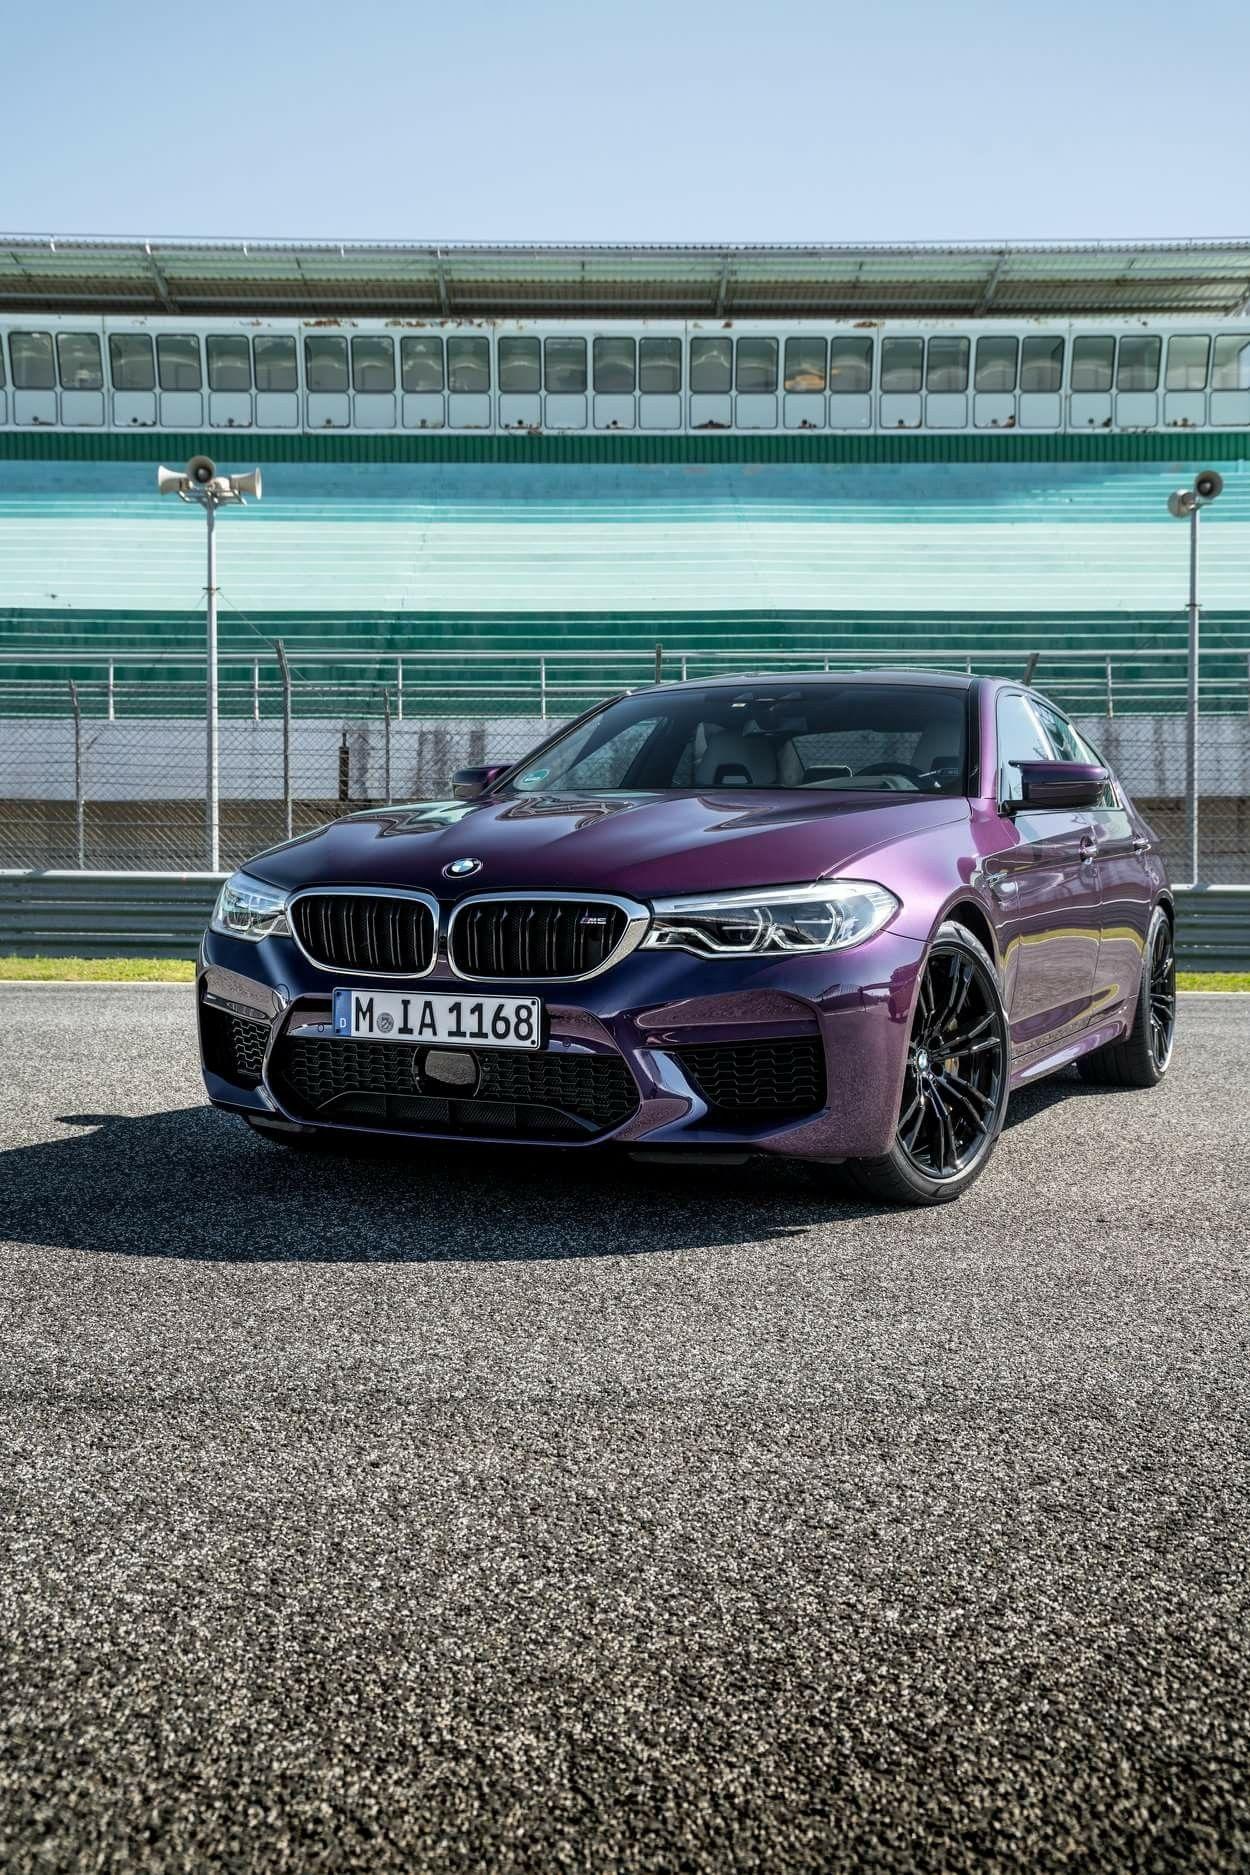 BMW F90 M5 in BMW Individual Special Paint Purple Silk metallic